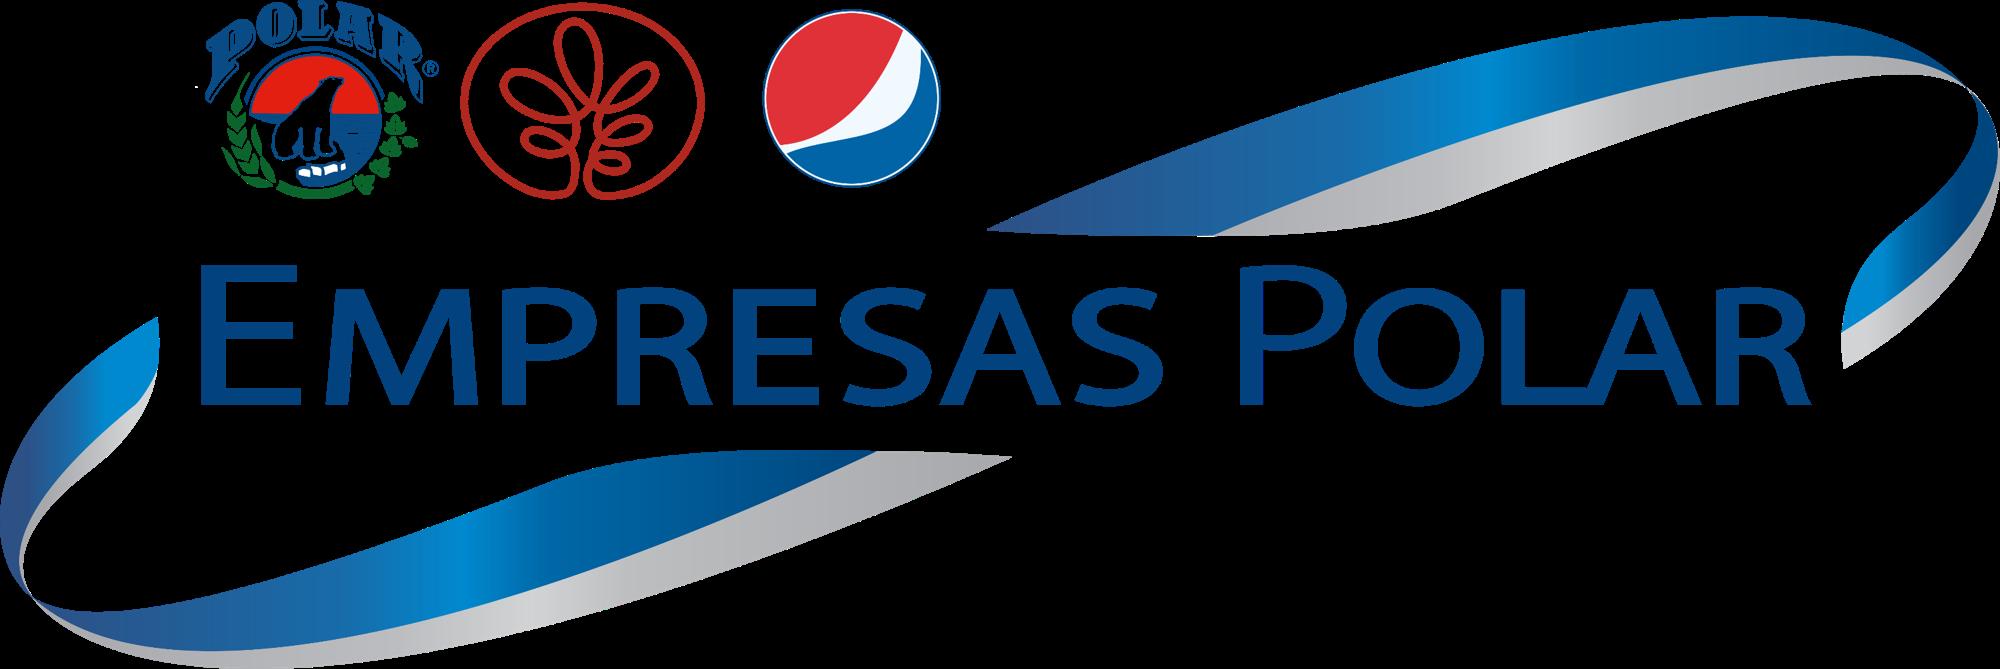 Empresas Polar | Logopedia | Fandom